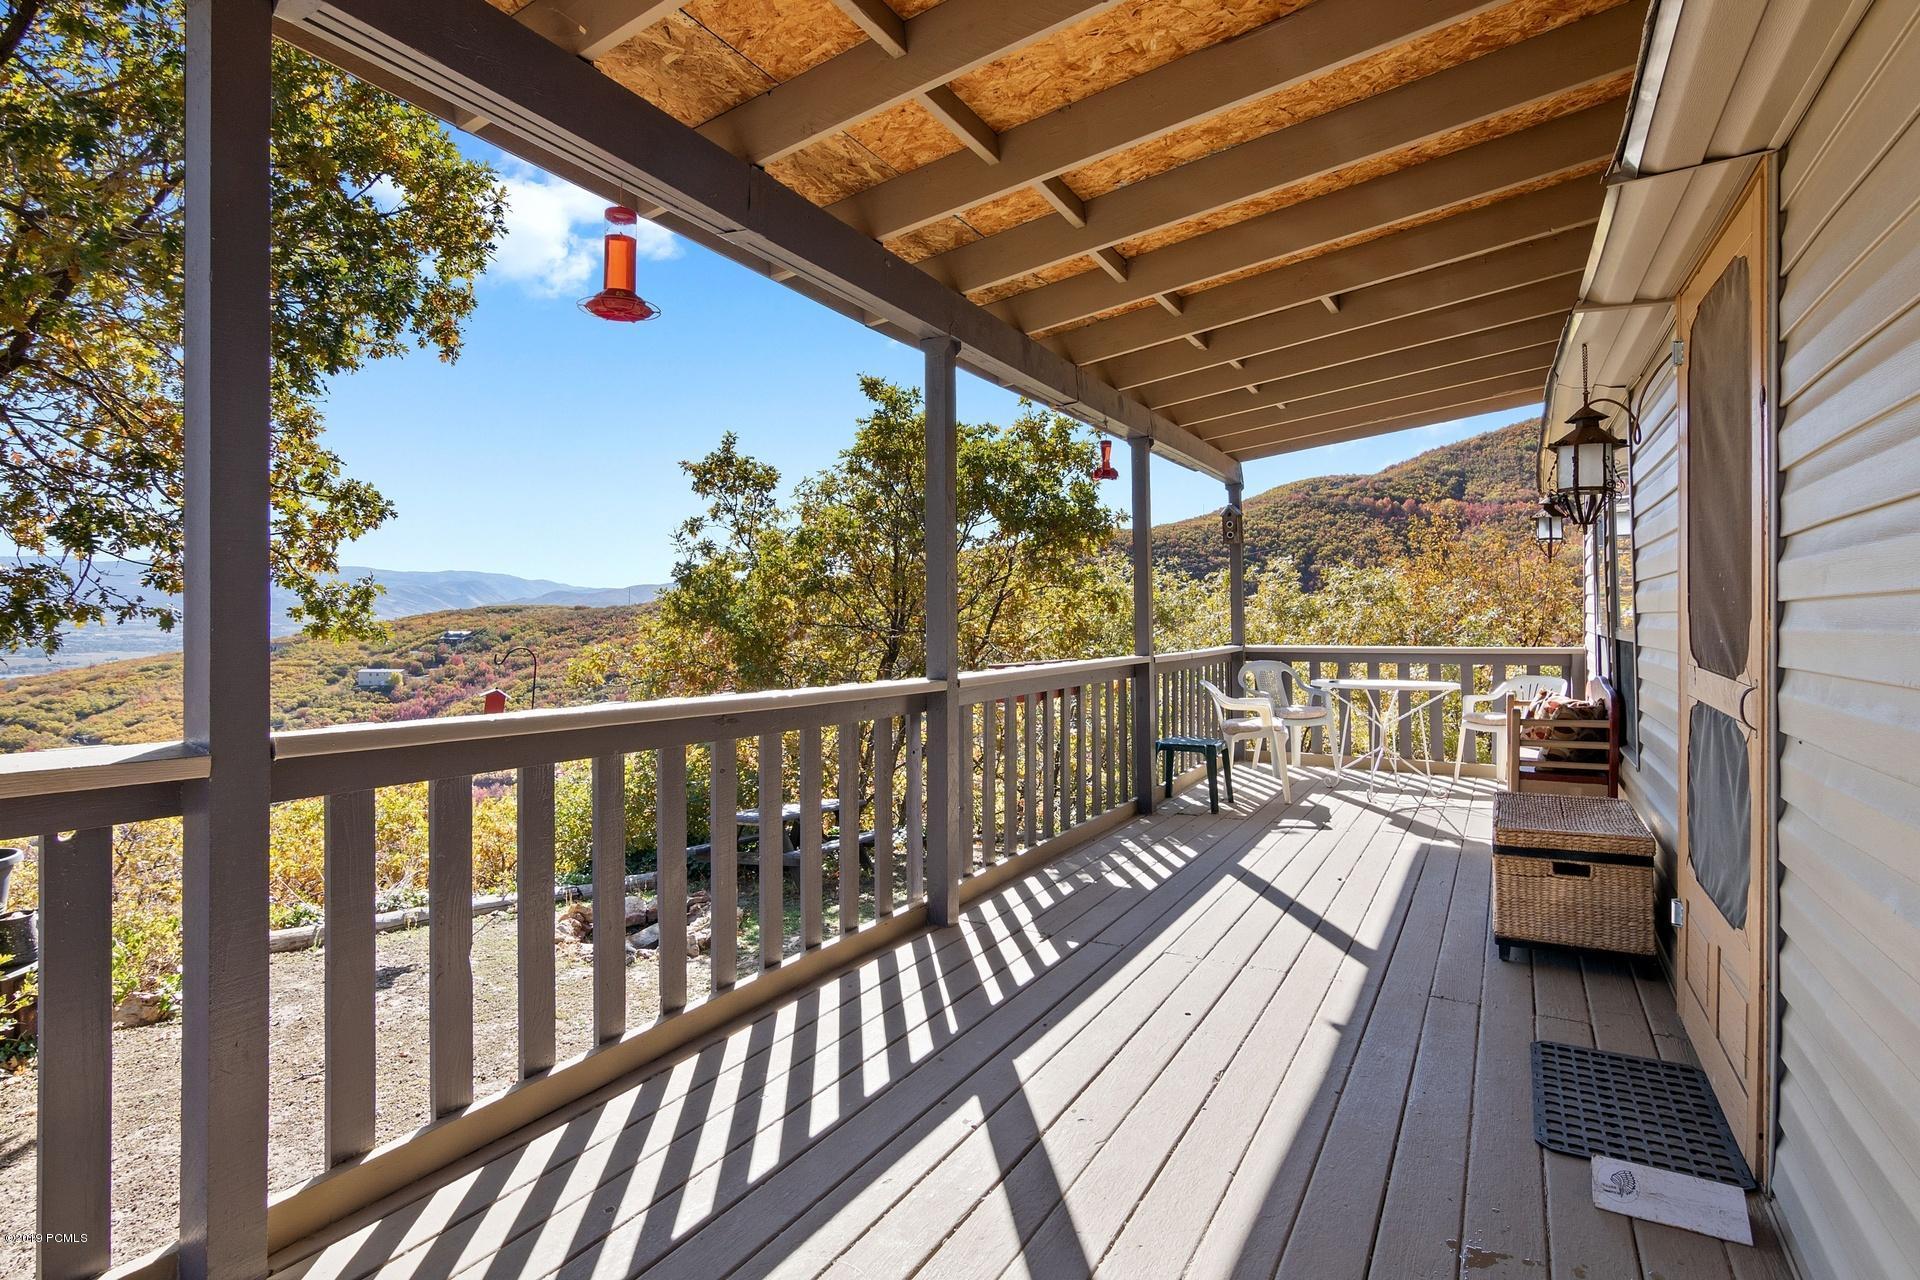 1412 Switzer Drive, Midway, Utah 84049, 3 Bedrooms Bedrooms, ,Single Family,For Sale,Switzer,20190109112430415765000000